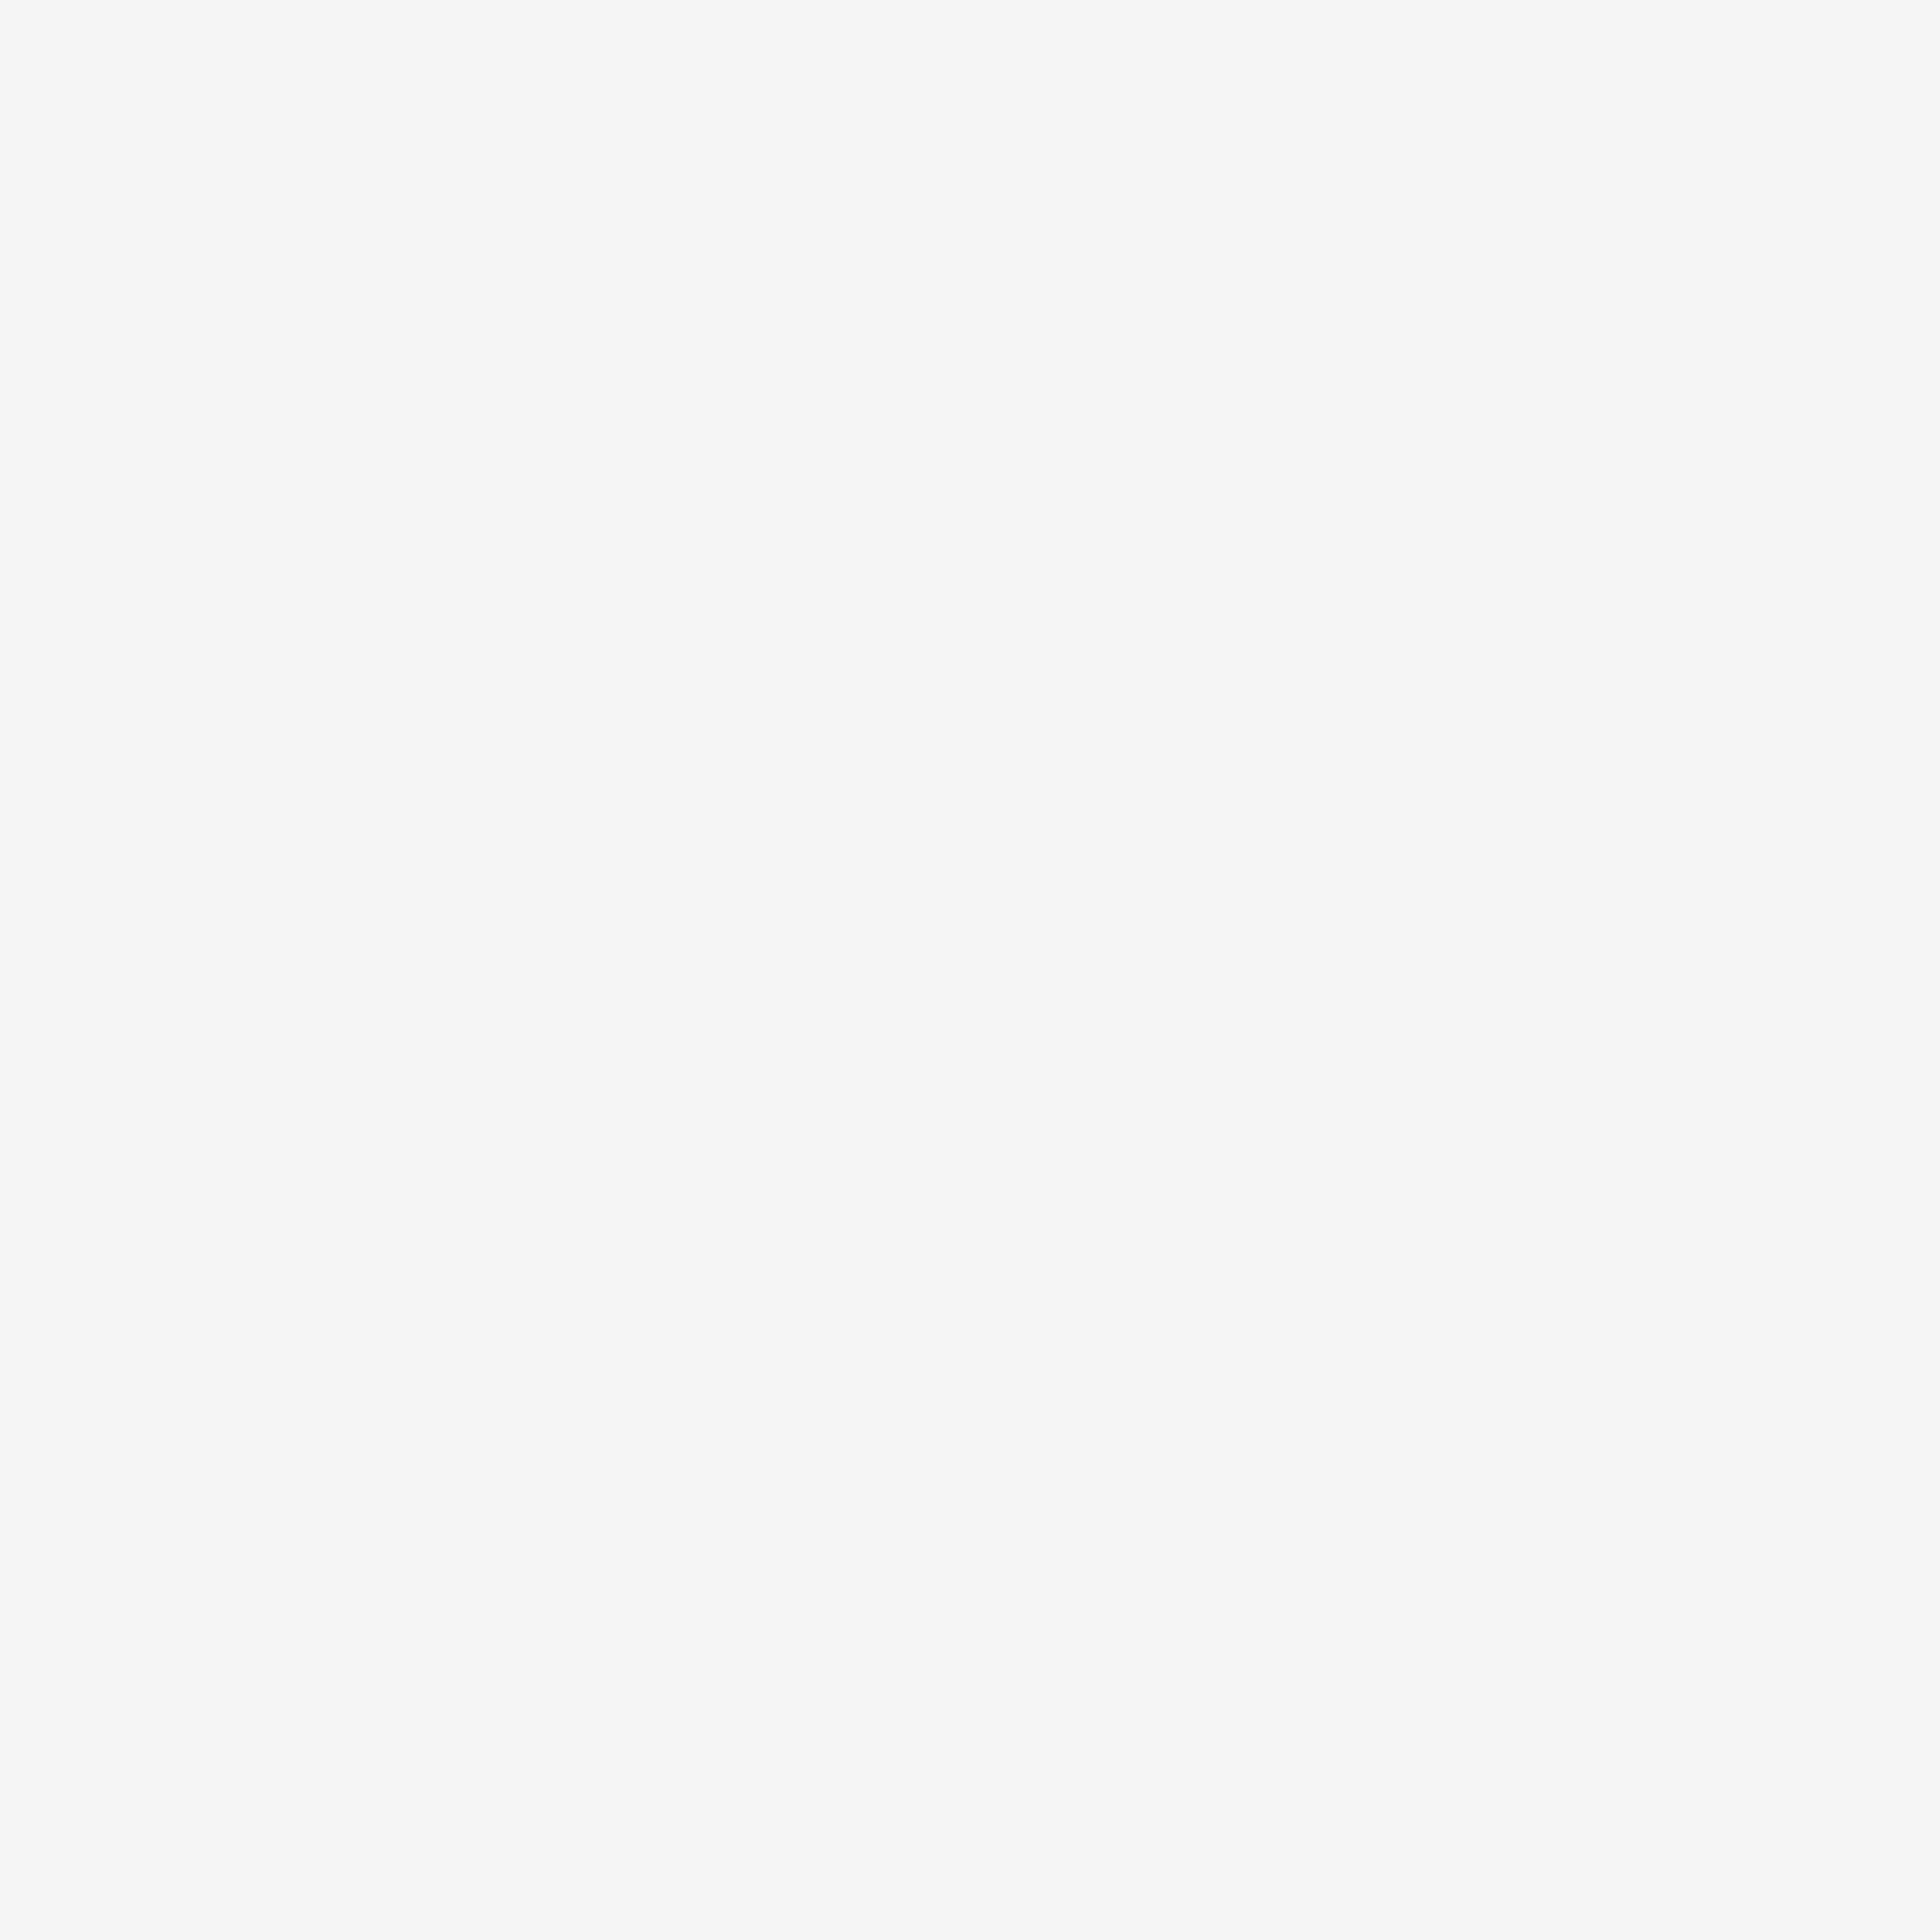 Chaussures Habillées Jaune Floris Van Bommel 14104 iJRnawB